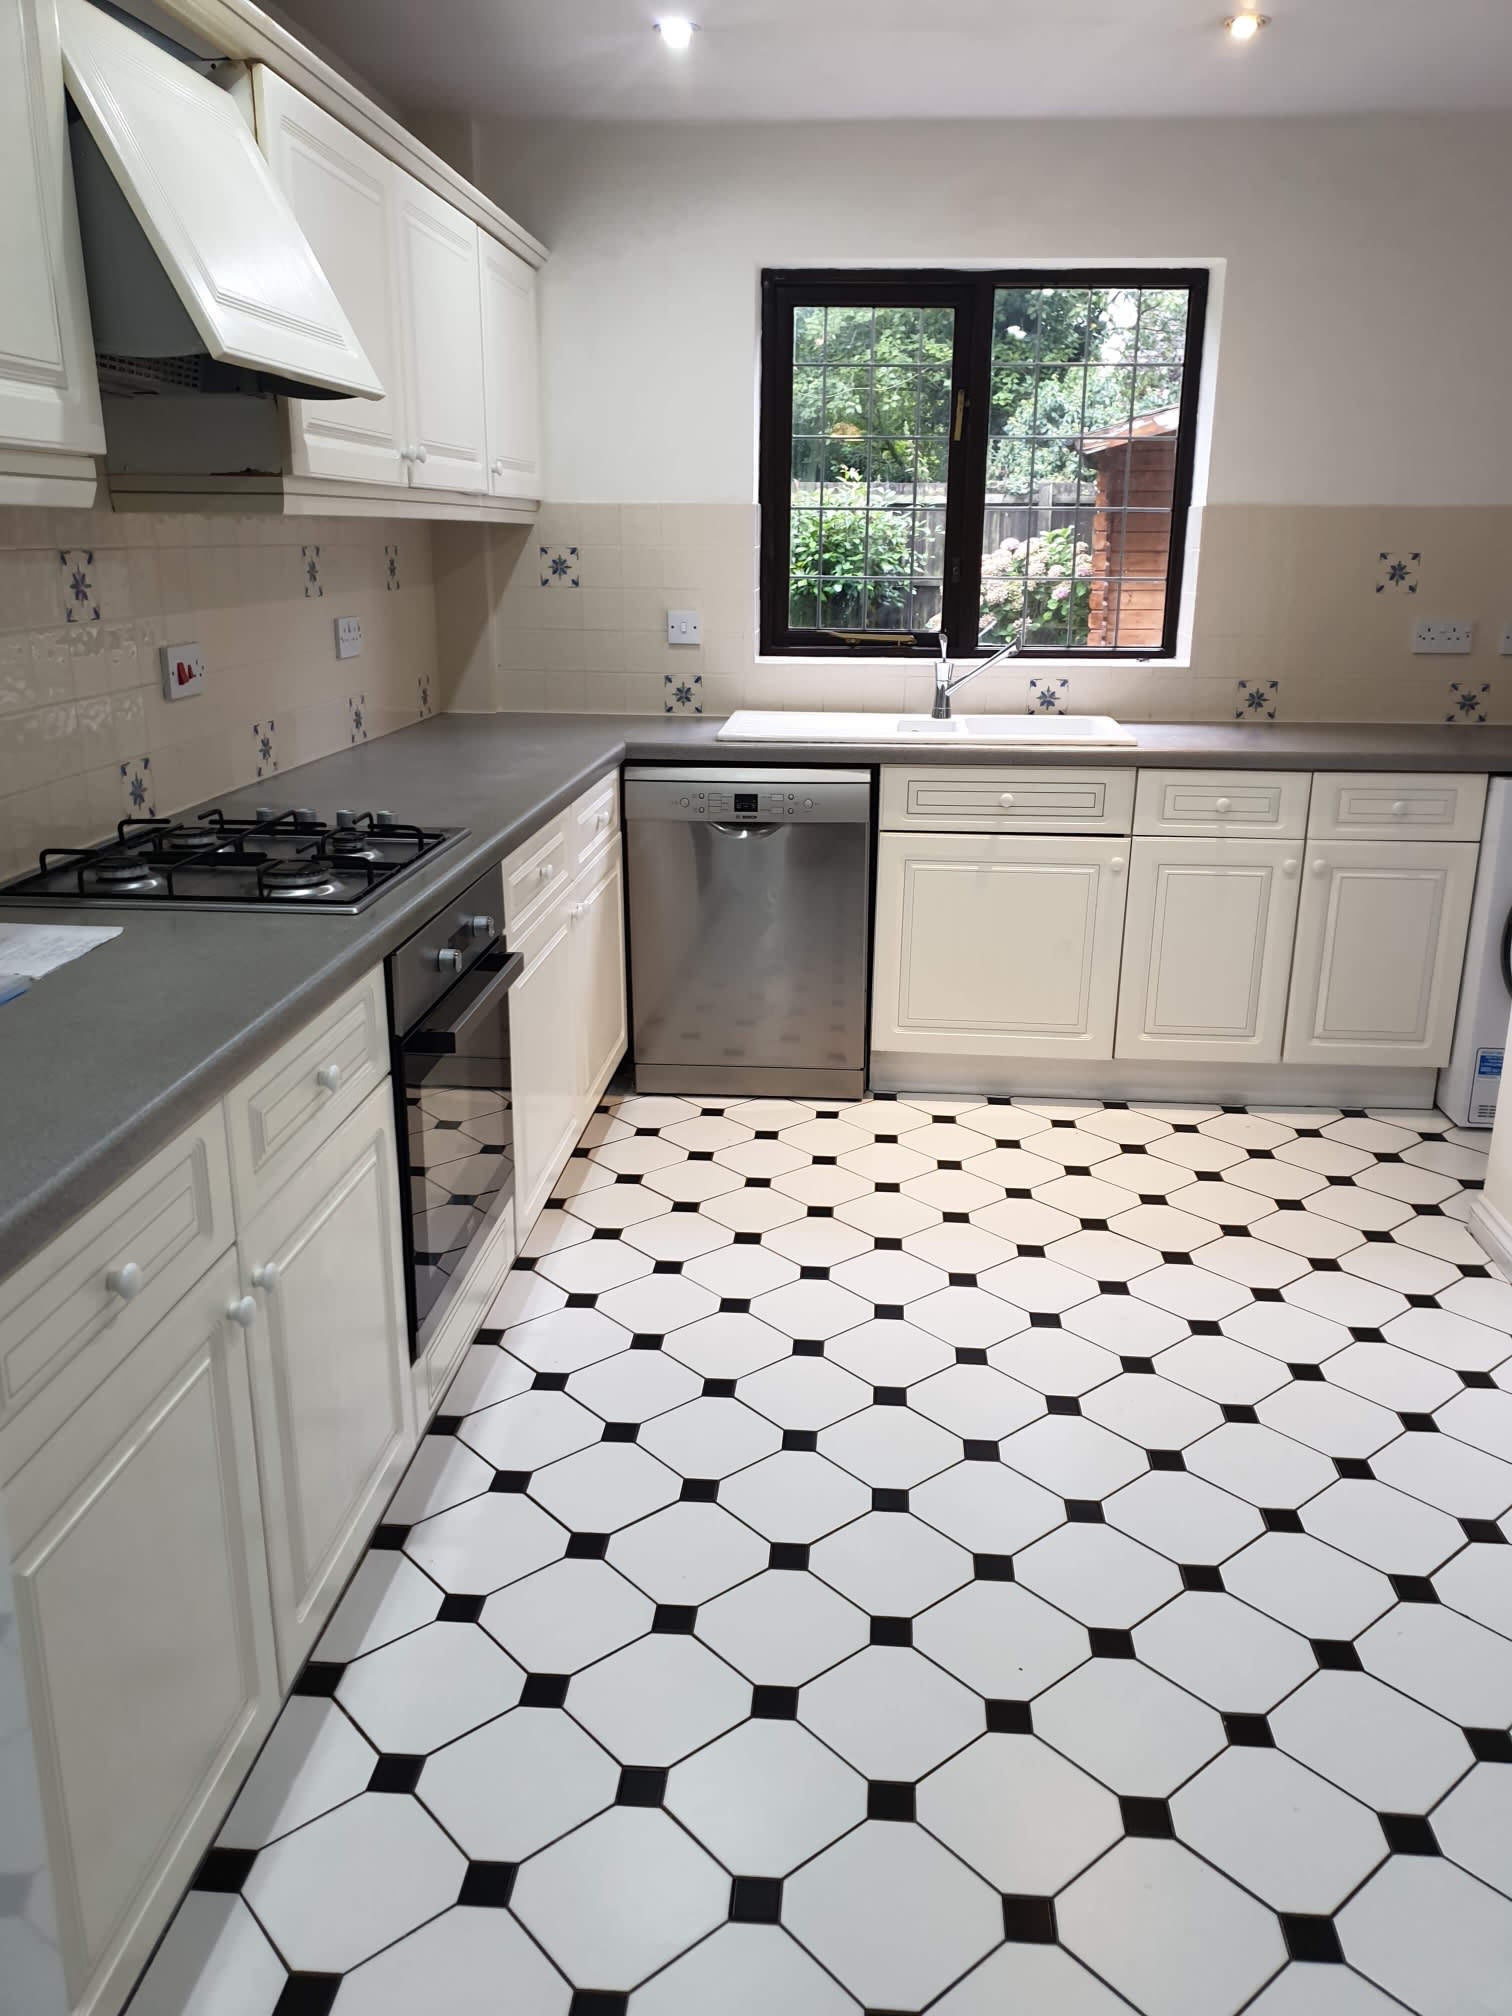 Valdi Cleaning Services End of Tenancy & Domestic Hemel Hempstead 07738 665028